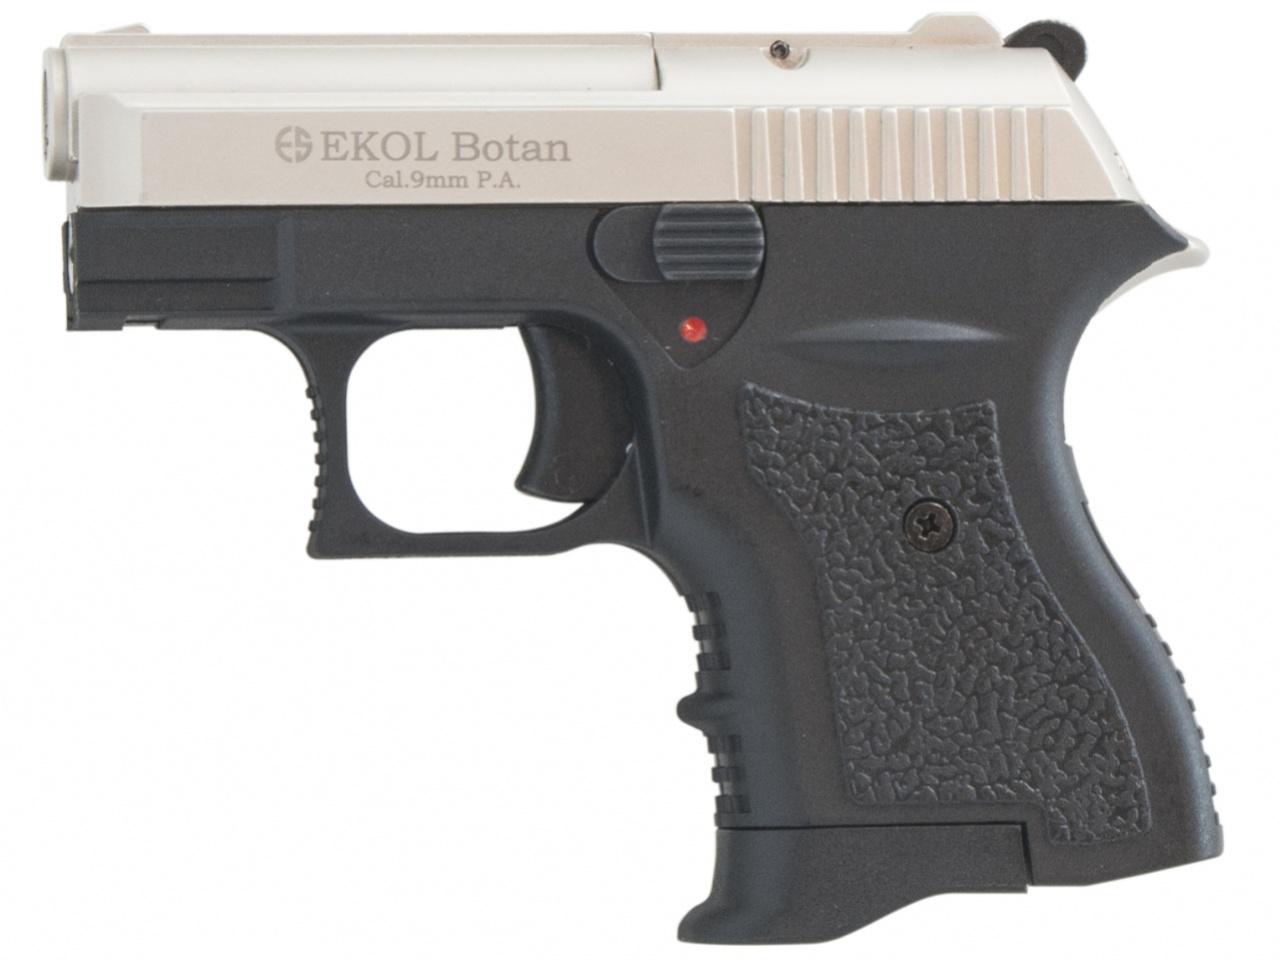 Pistolet gazowy Ekol Botan satyn nikiel kal.9mm